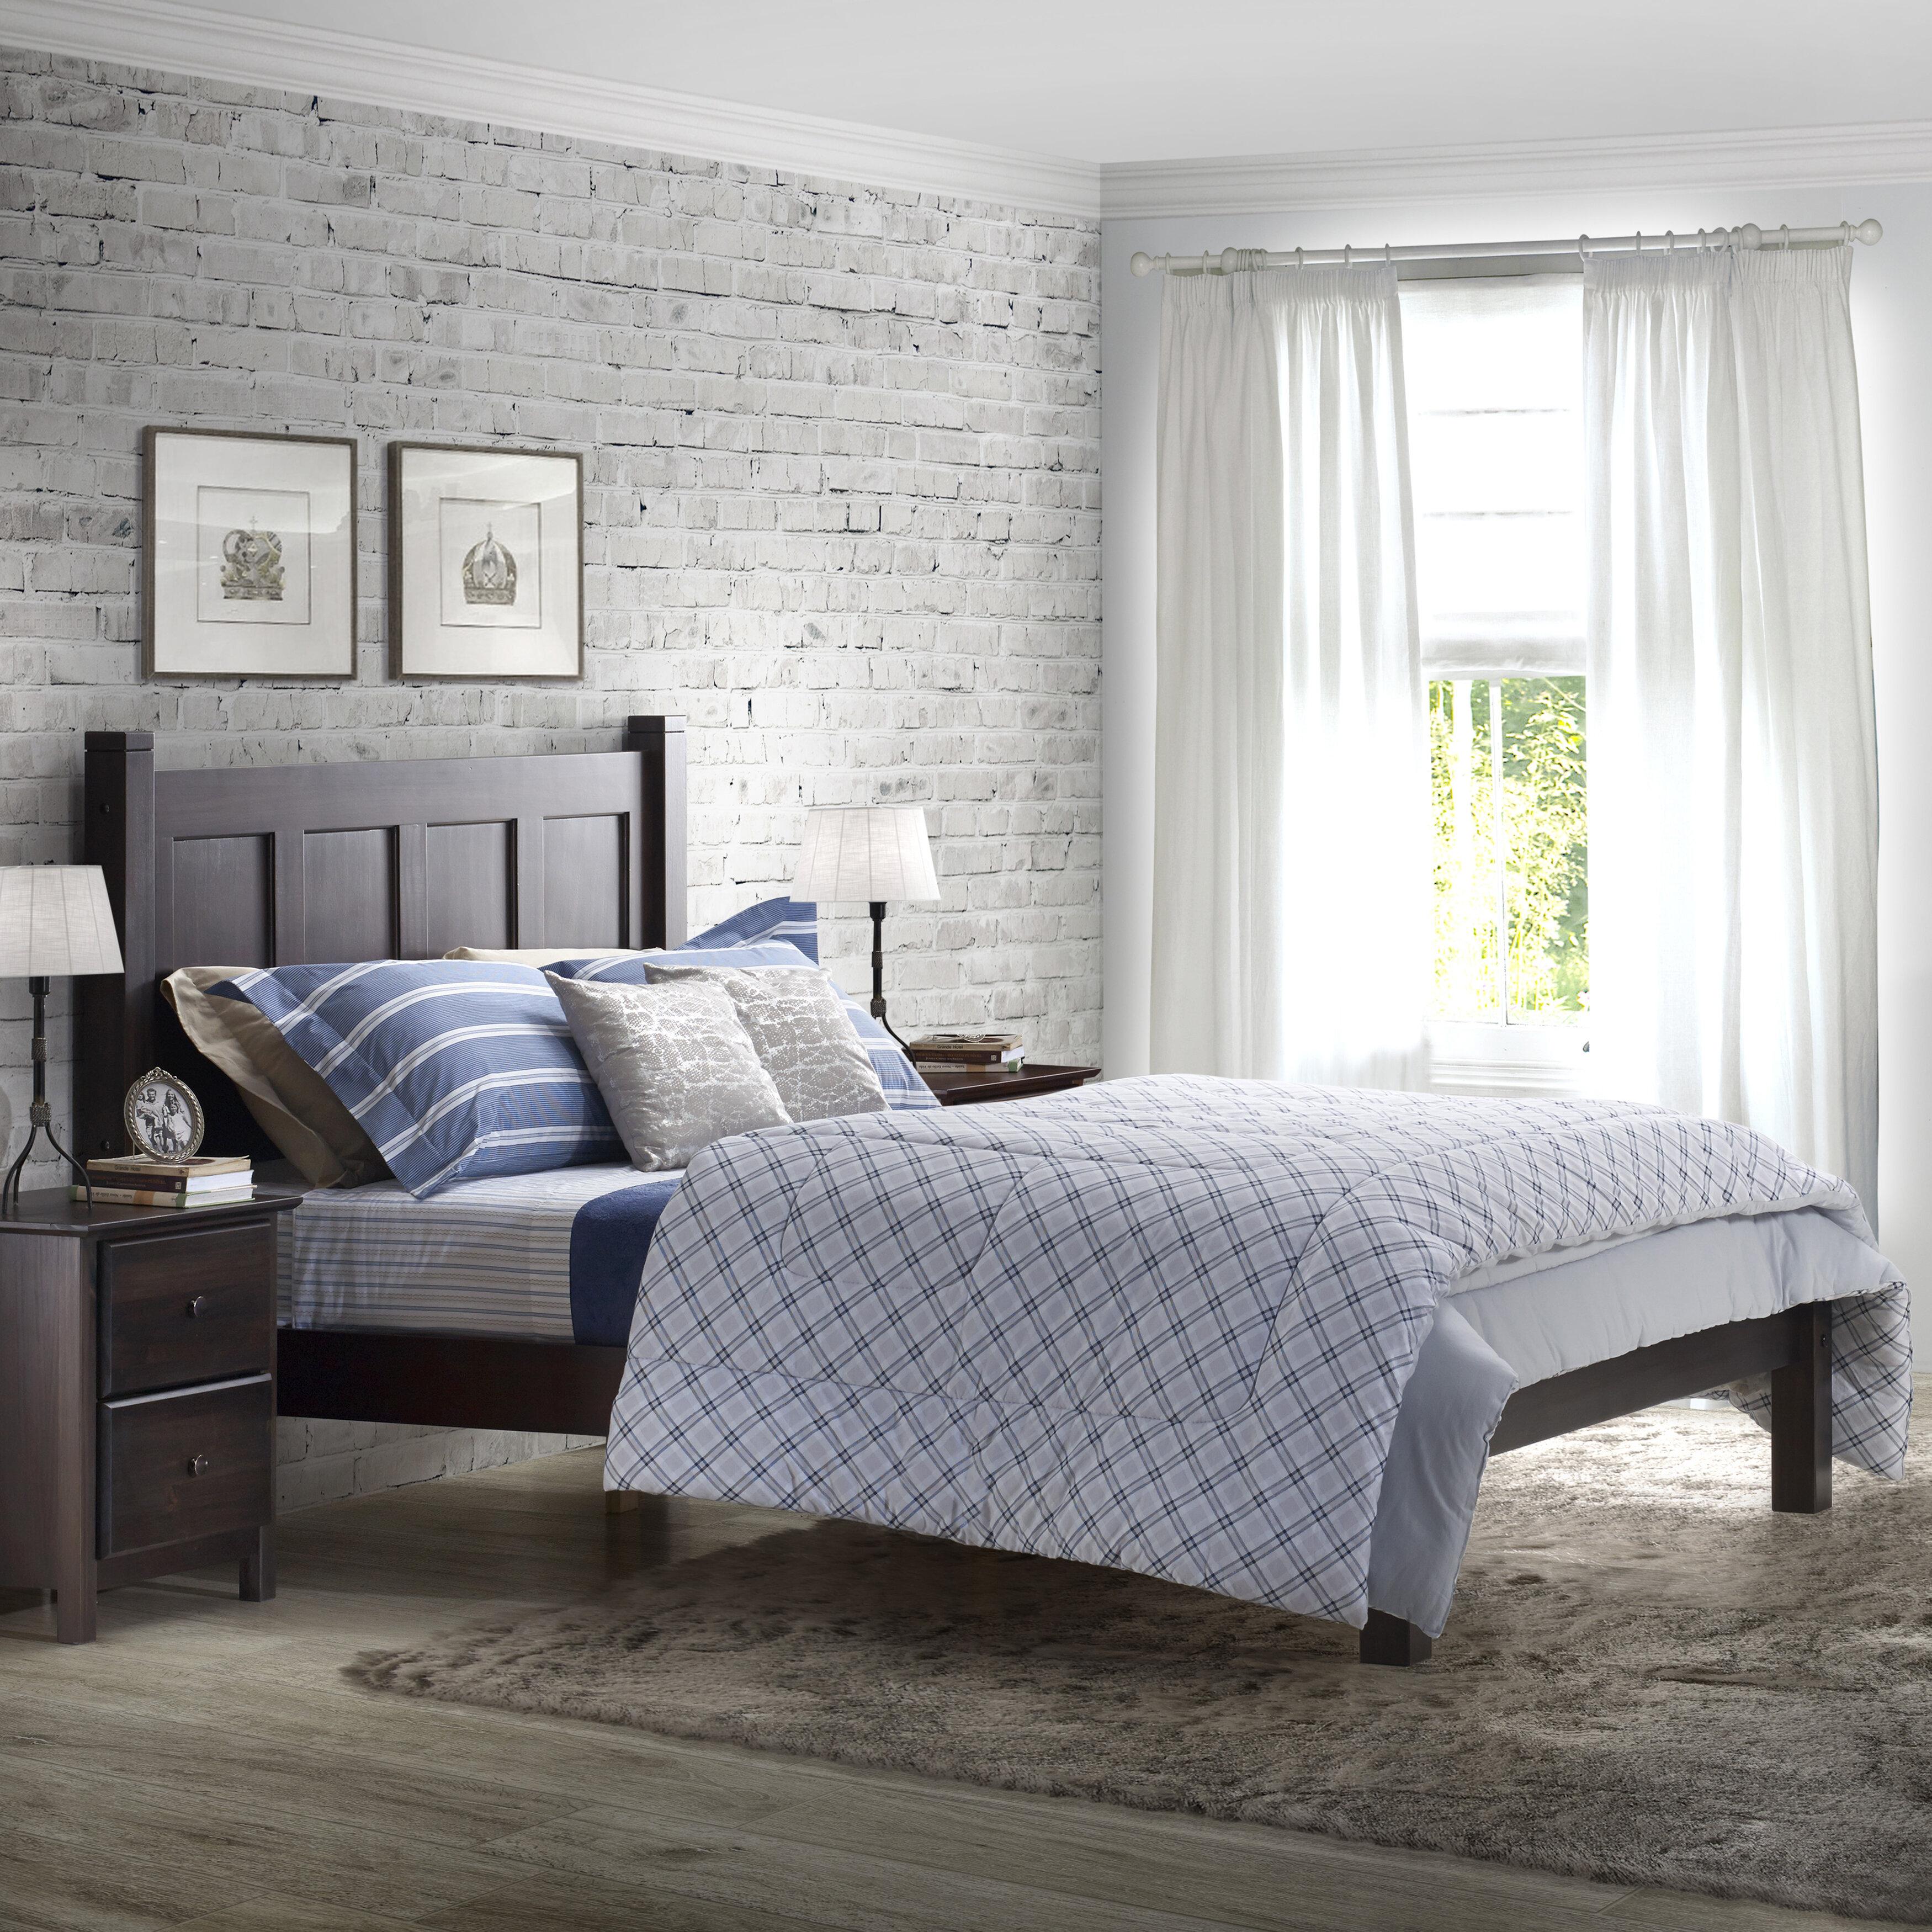 Espresso Queen Size Wood Platform Bed Frame Panel Headboard Bedroom Furniture